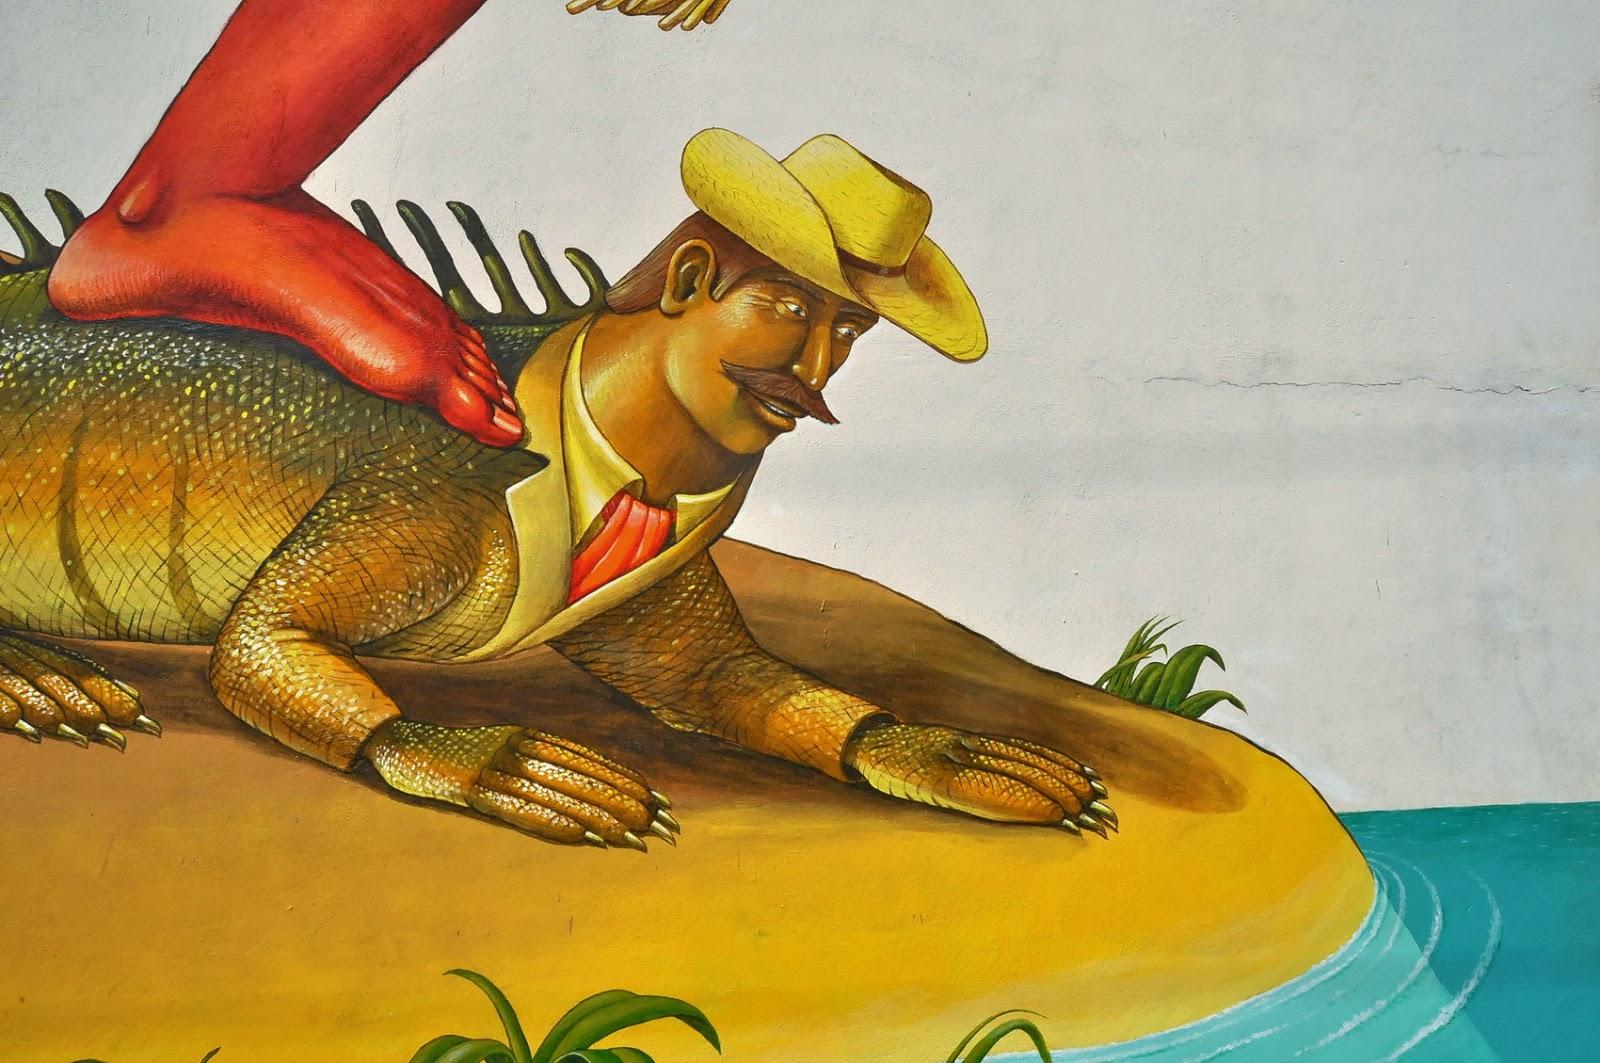 interesni-kazki-new-mural-campeche-mexico-13